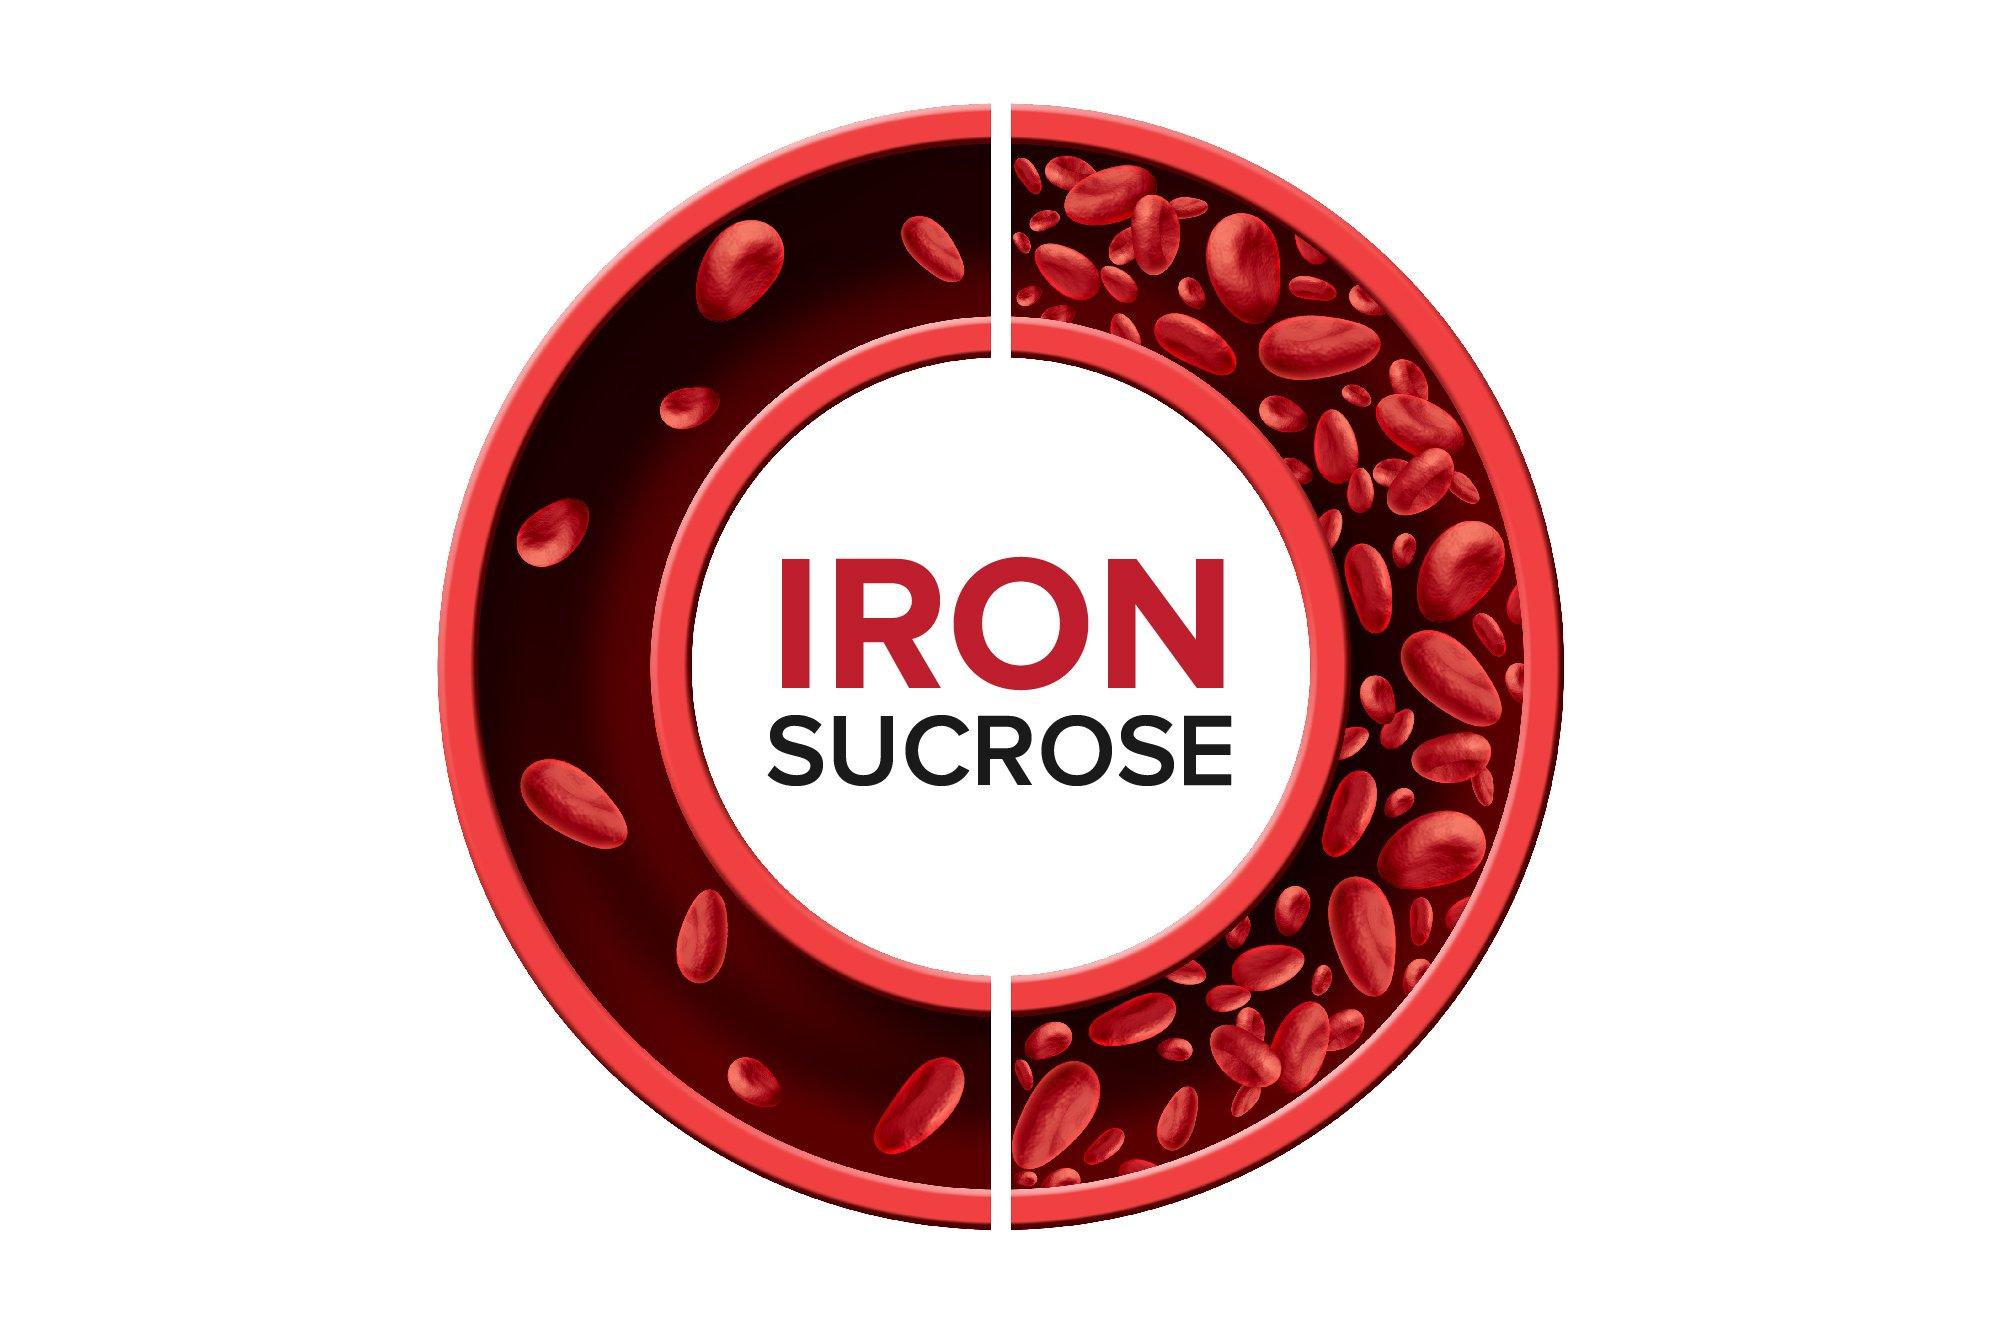 Iron deficiency anemia_Iron Sucrose